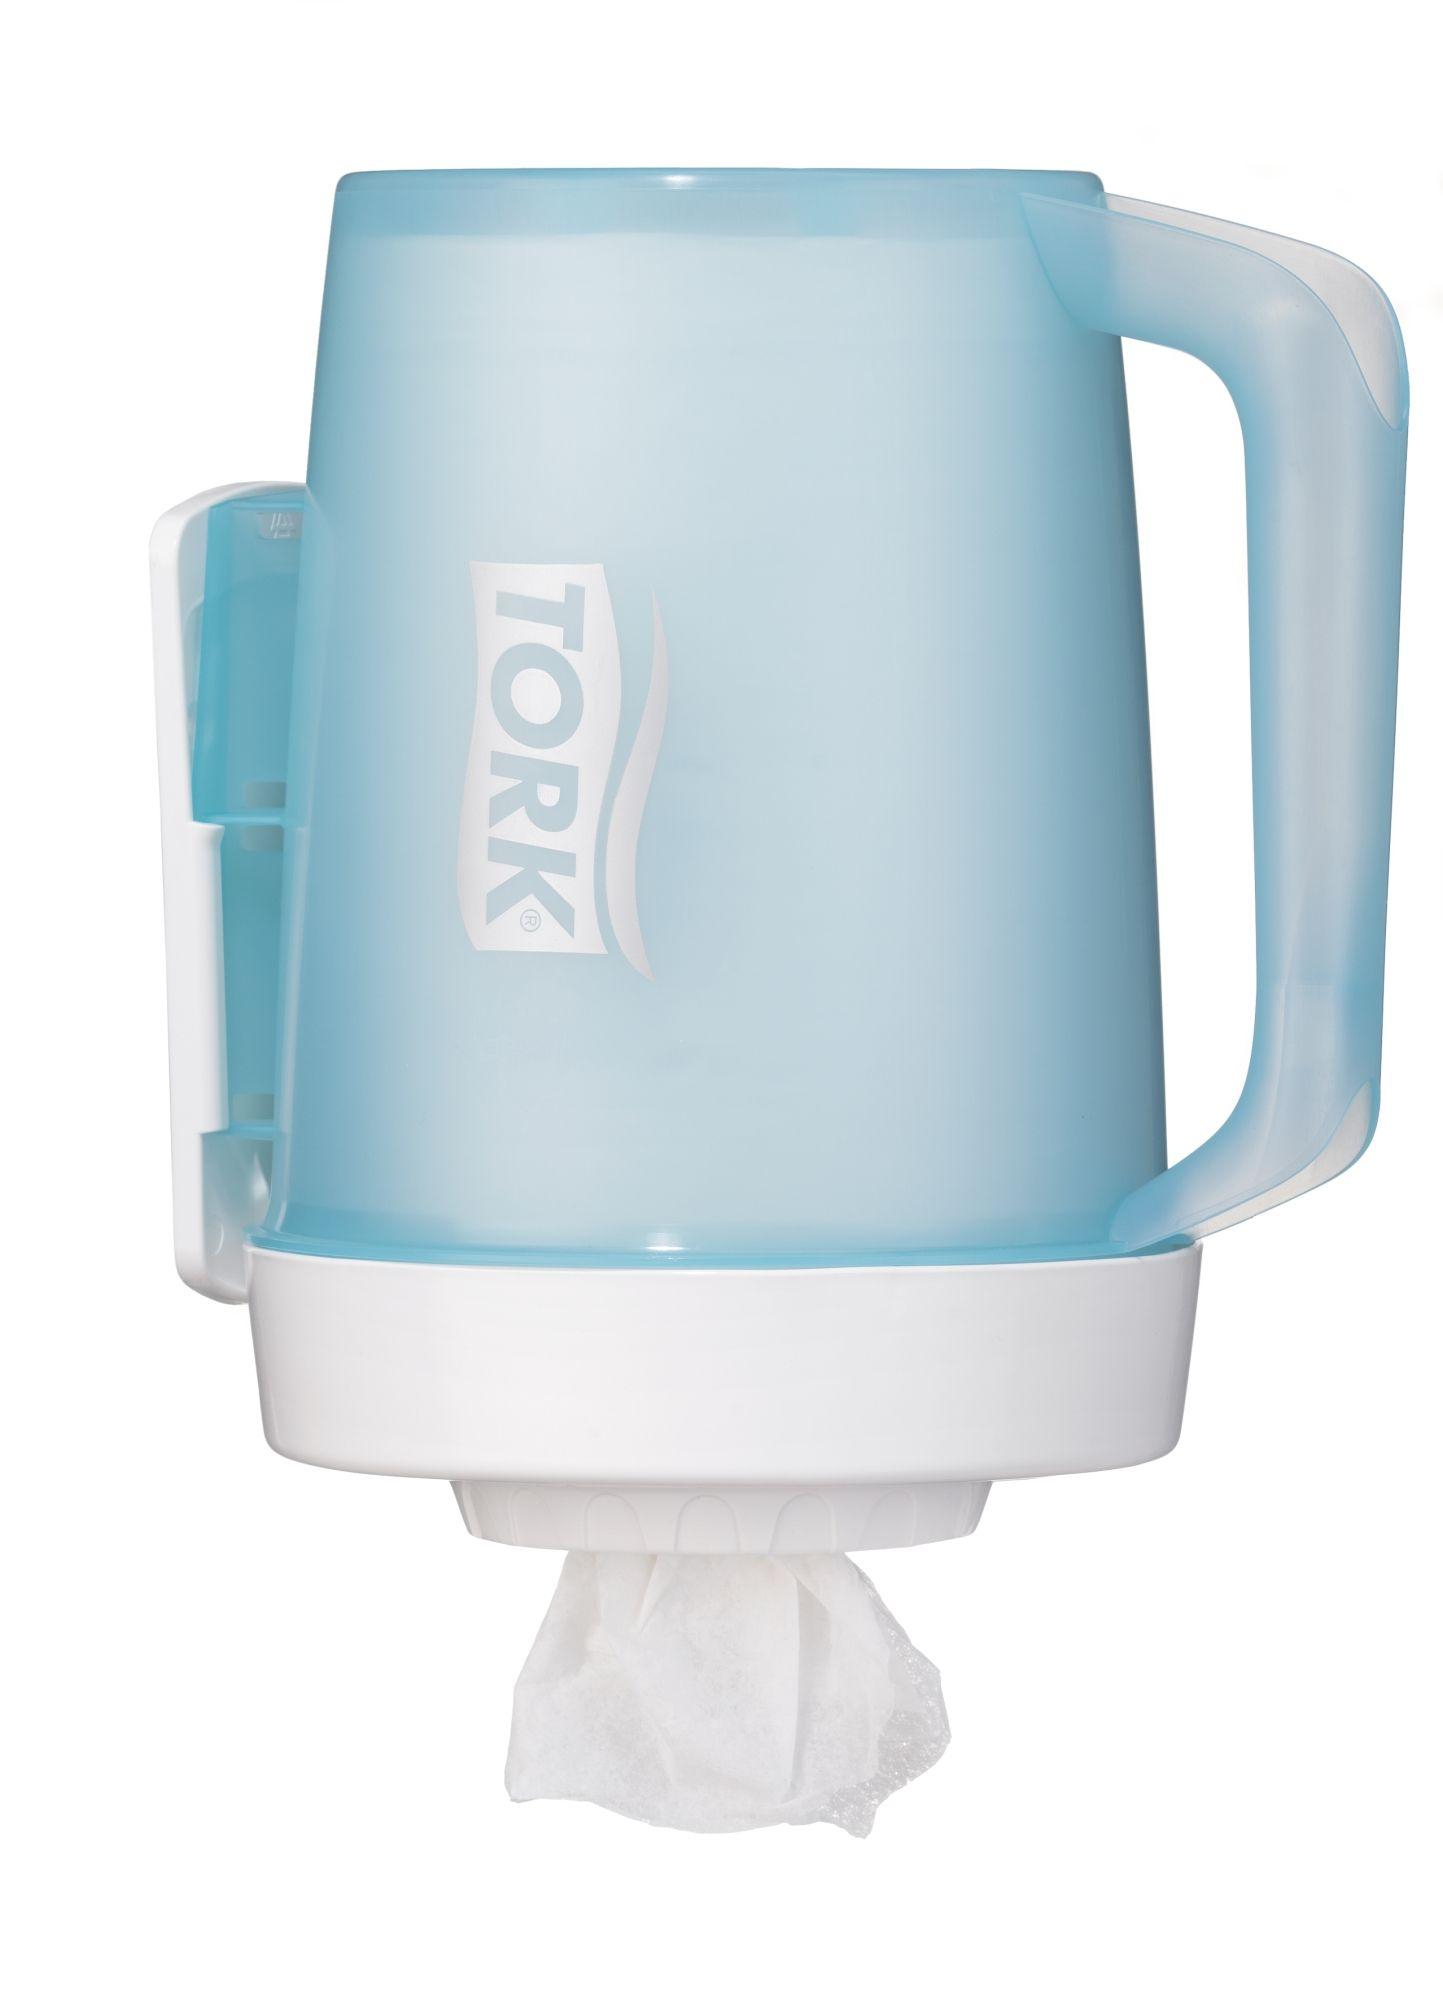 Tork Portable Mini Centrefeed Dispenser: Compact centrefeed ...